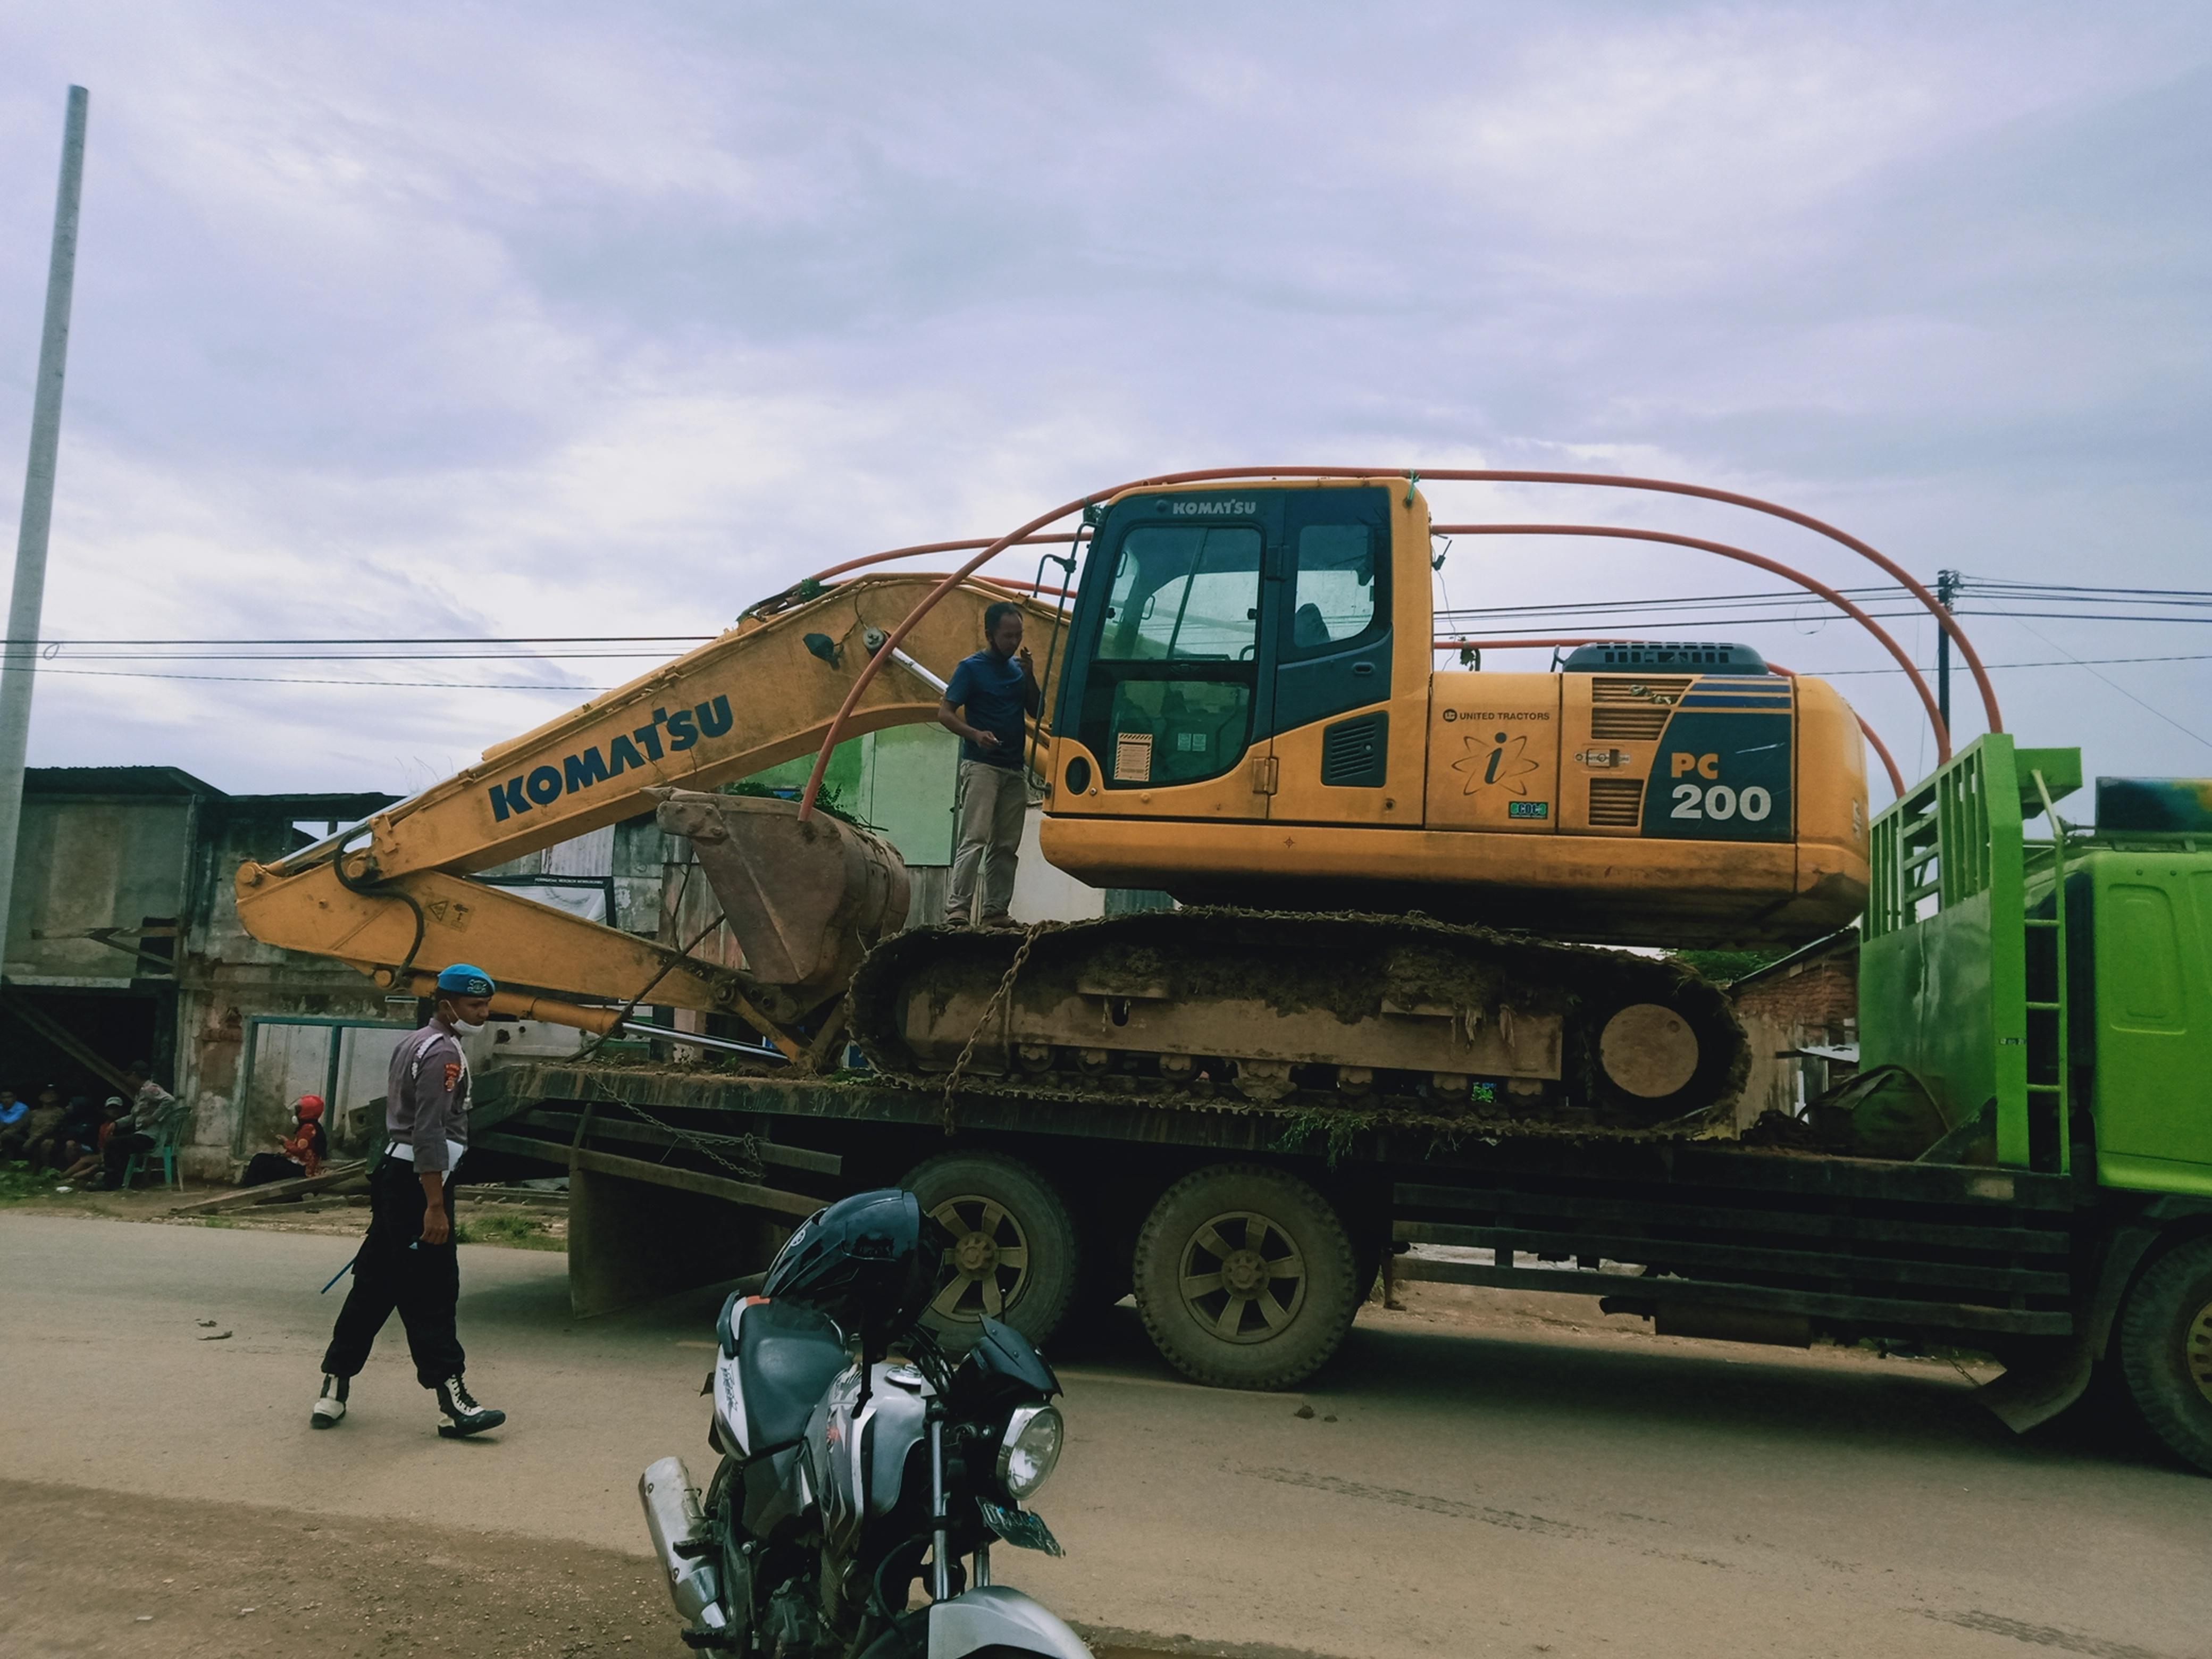 Satu Unit alat berat diturunkan untuk melakukan penggusuran di lokasi Eks pasar lama Kasipute